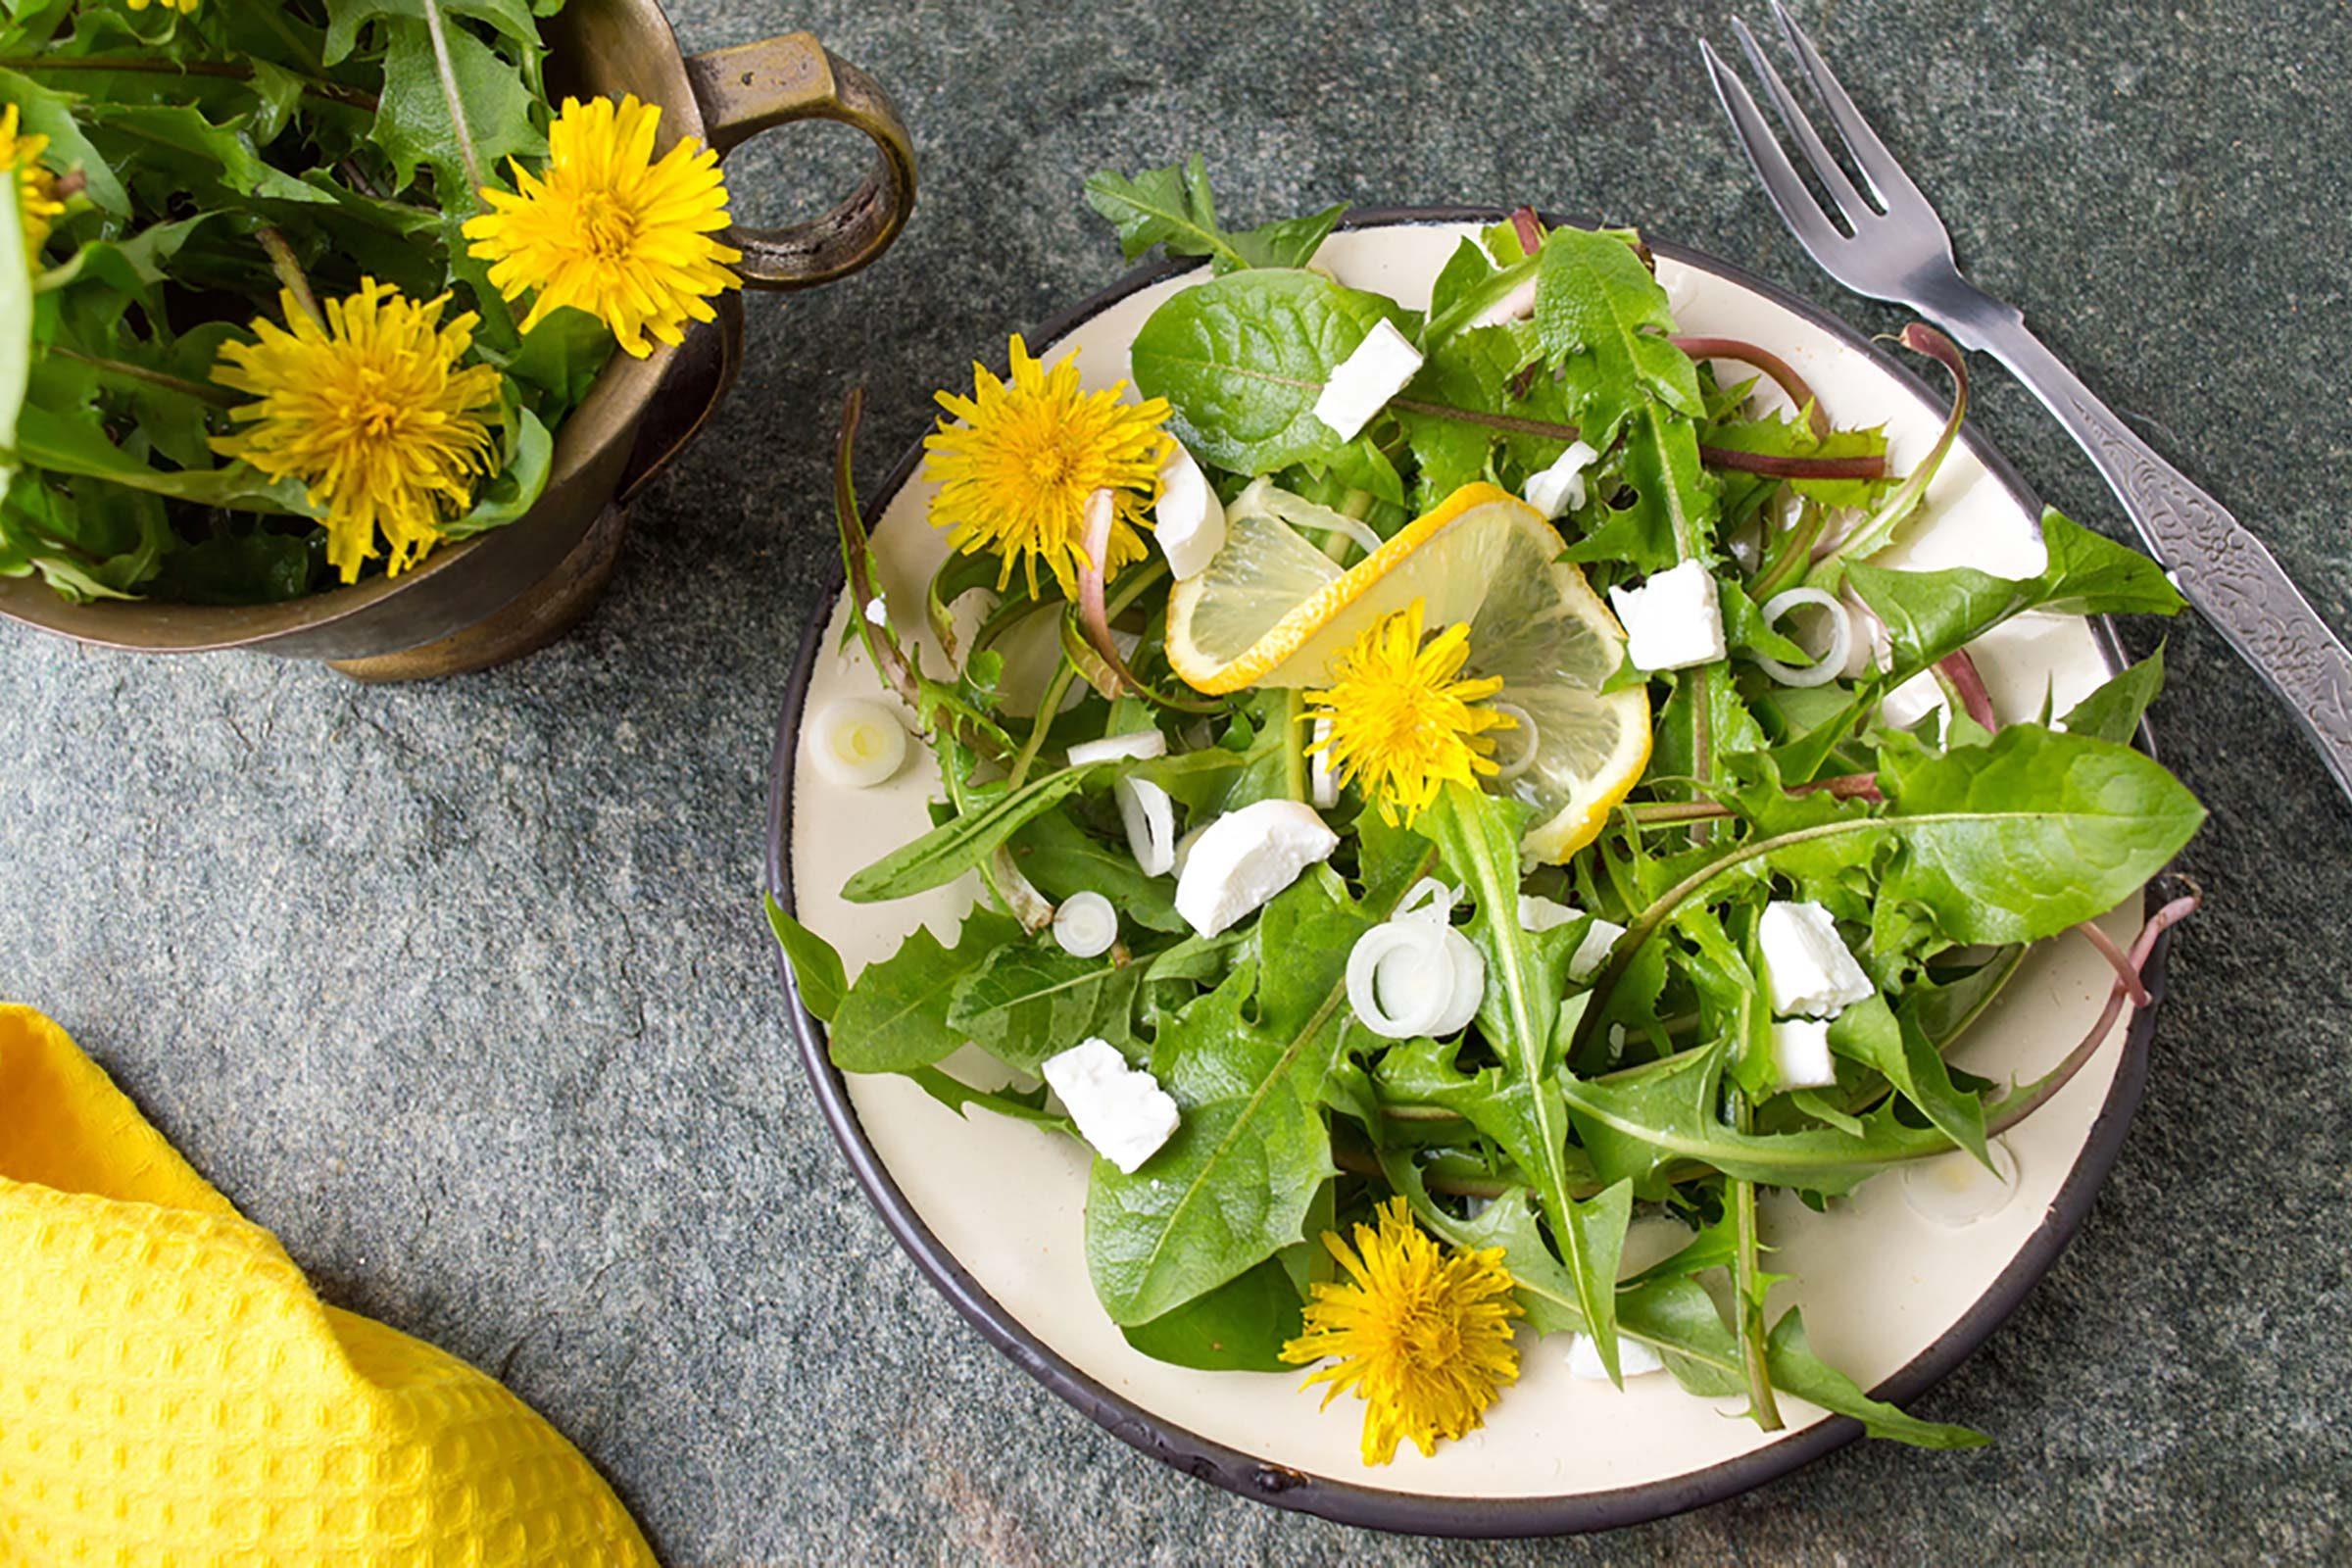 green salad with dandelions